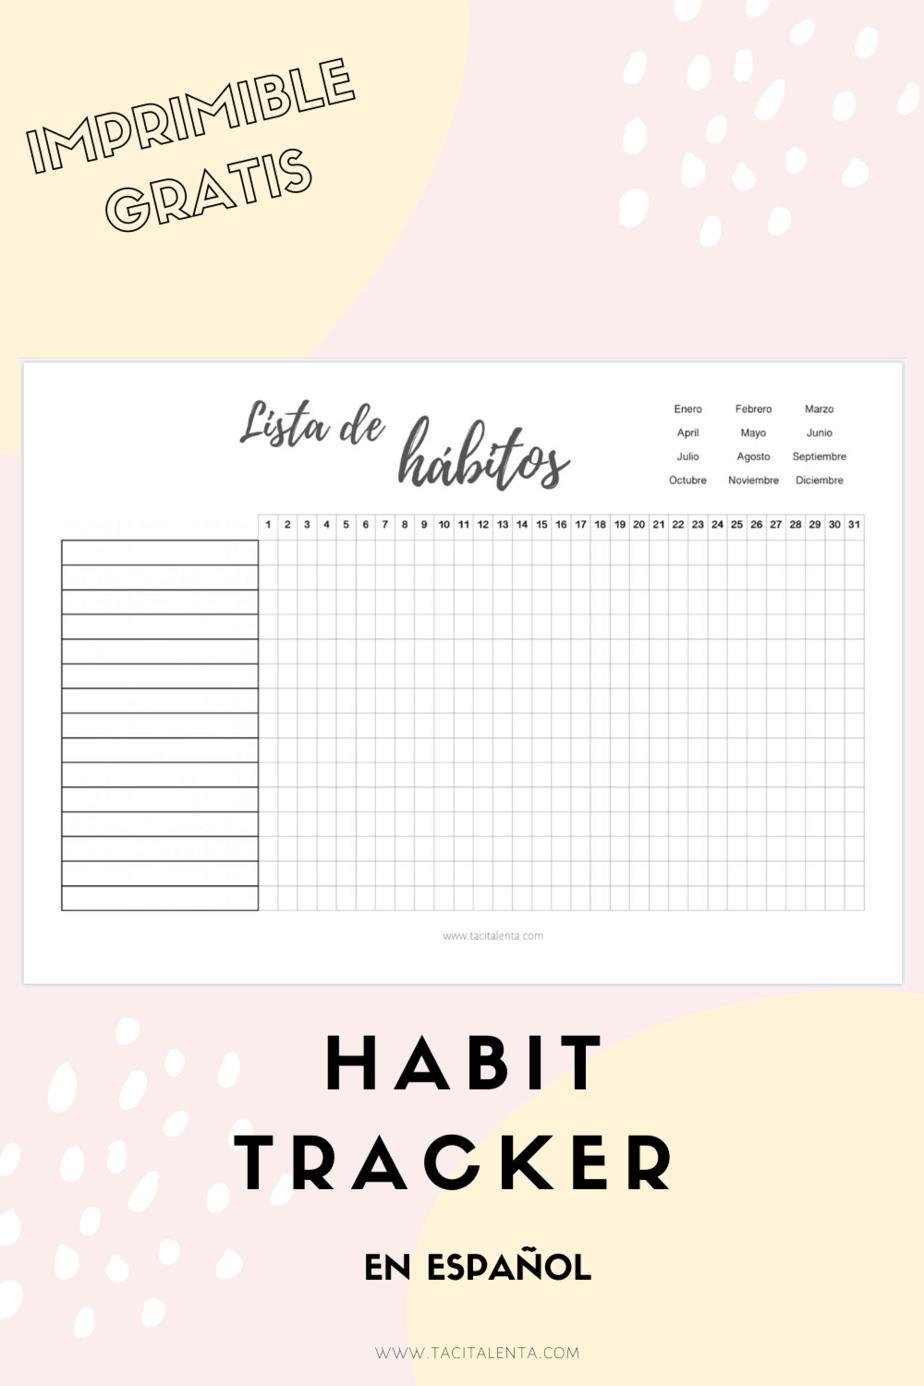 Habit tracker (registro de hábitos) tacita lenta